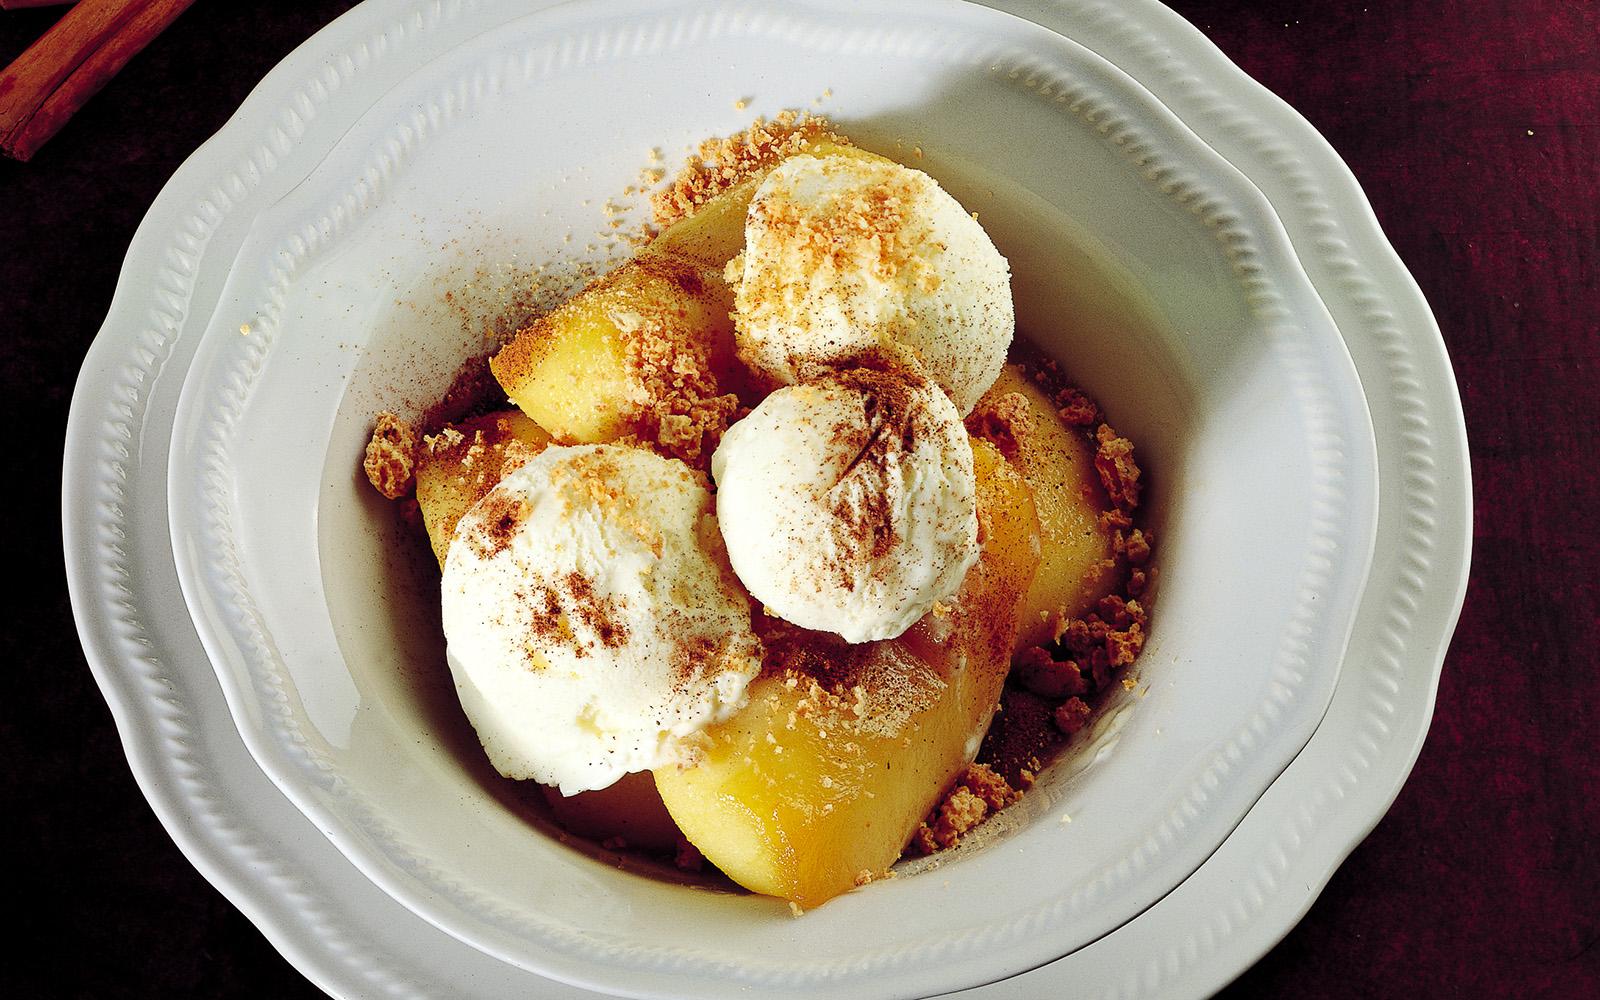 Caramelized Apples to ice cream